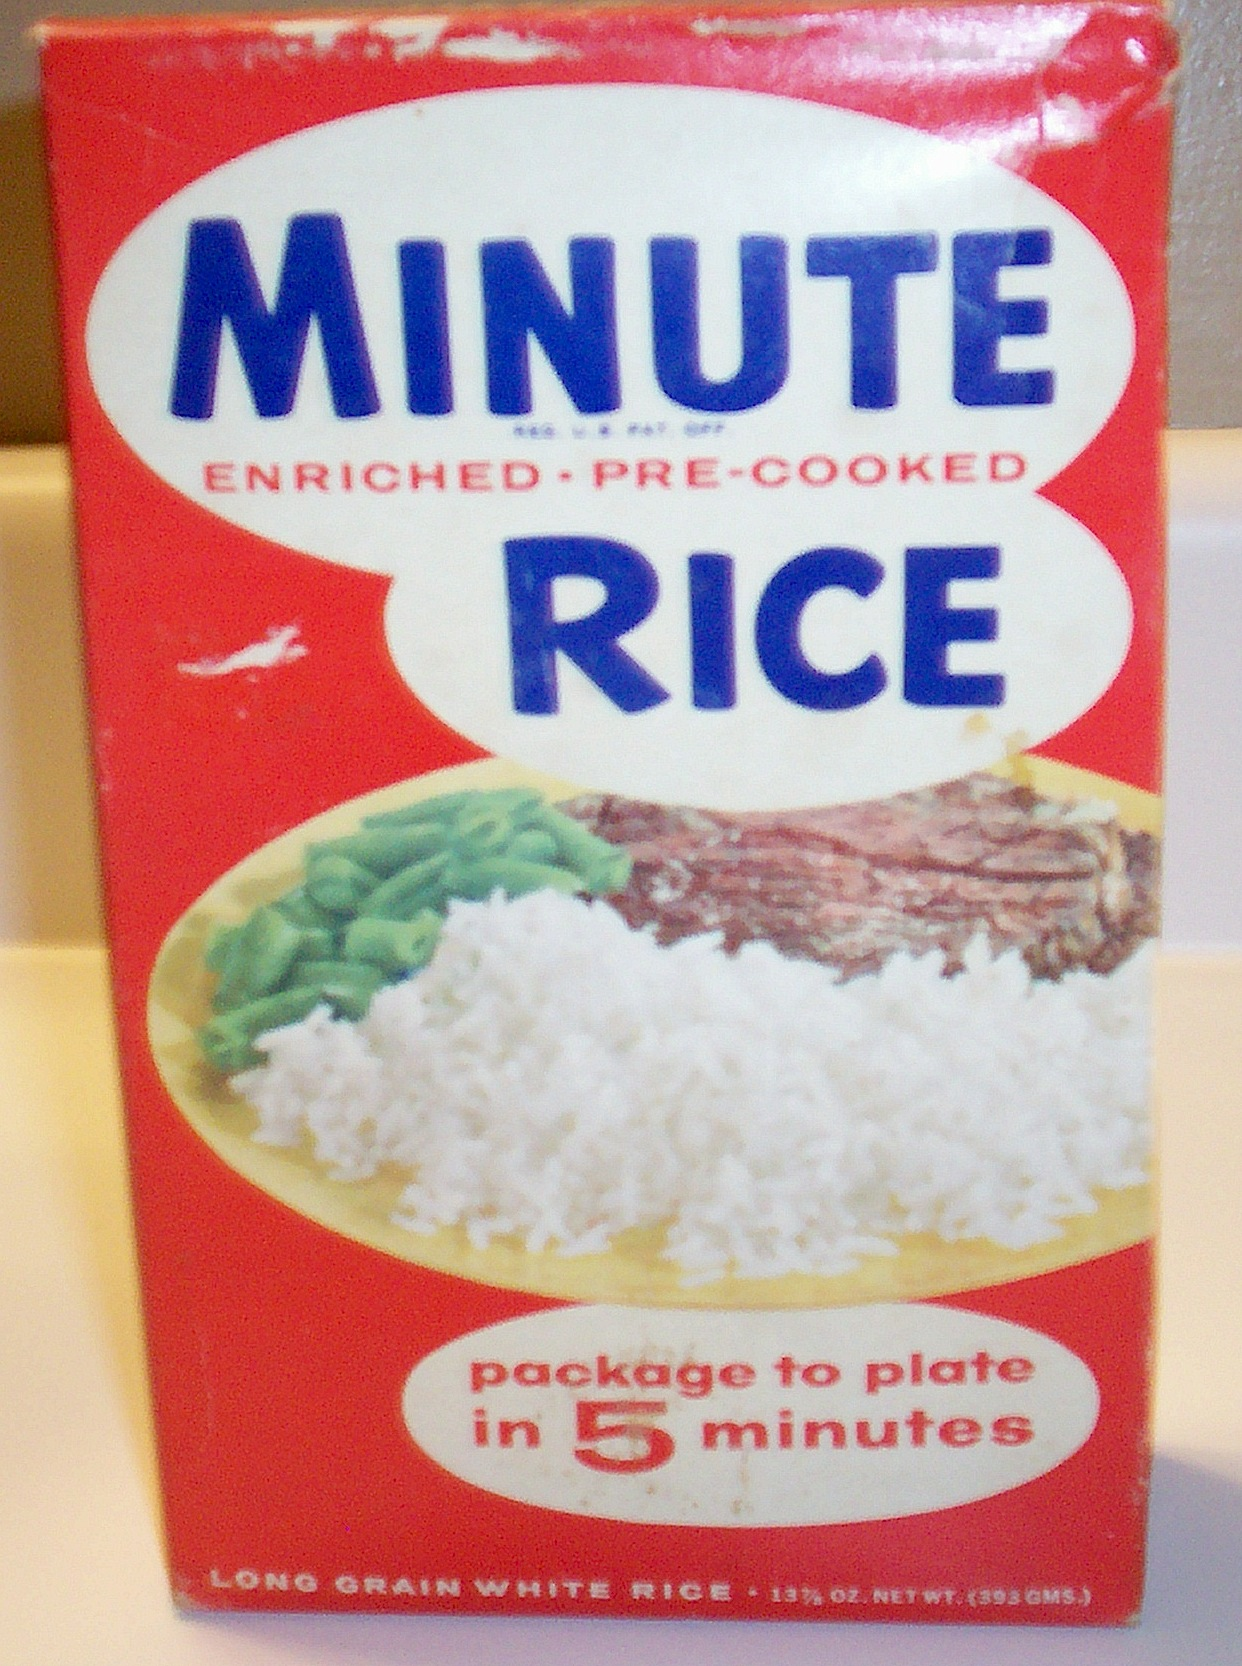 Minute Rice box | Flickr - Photo Sharing!